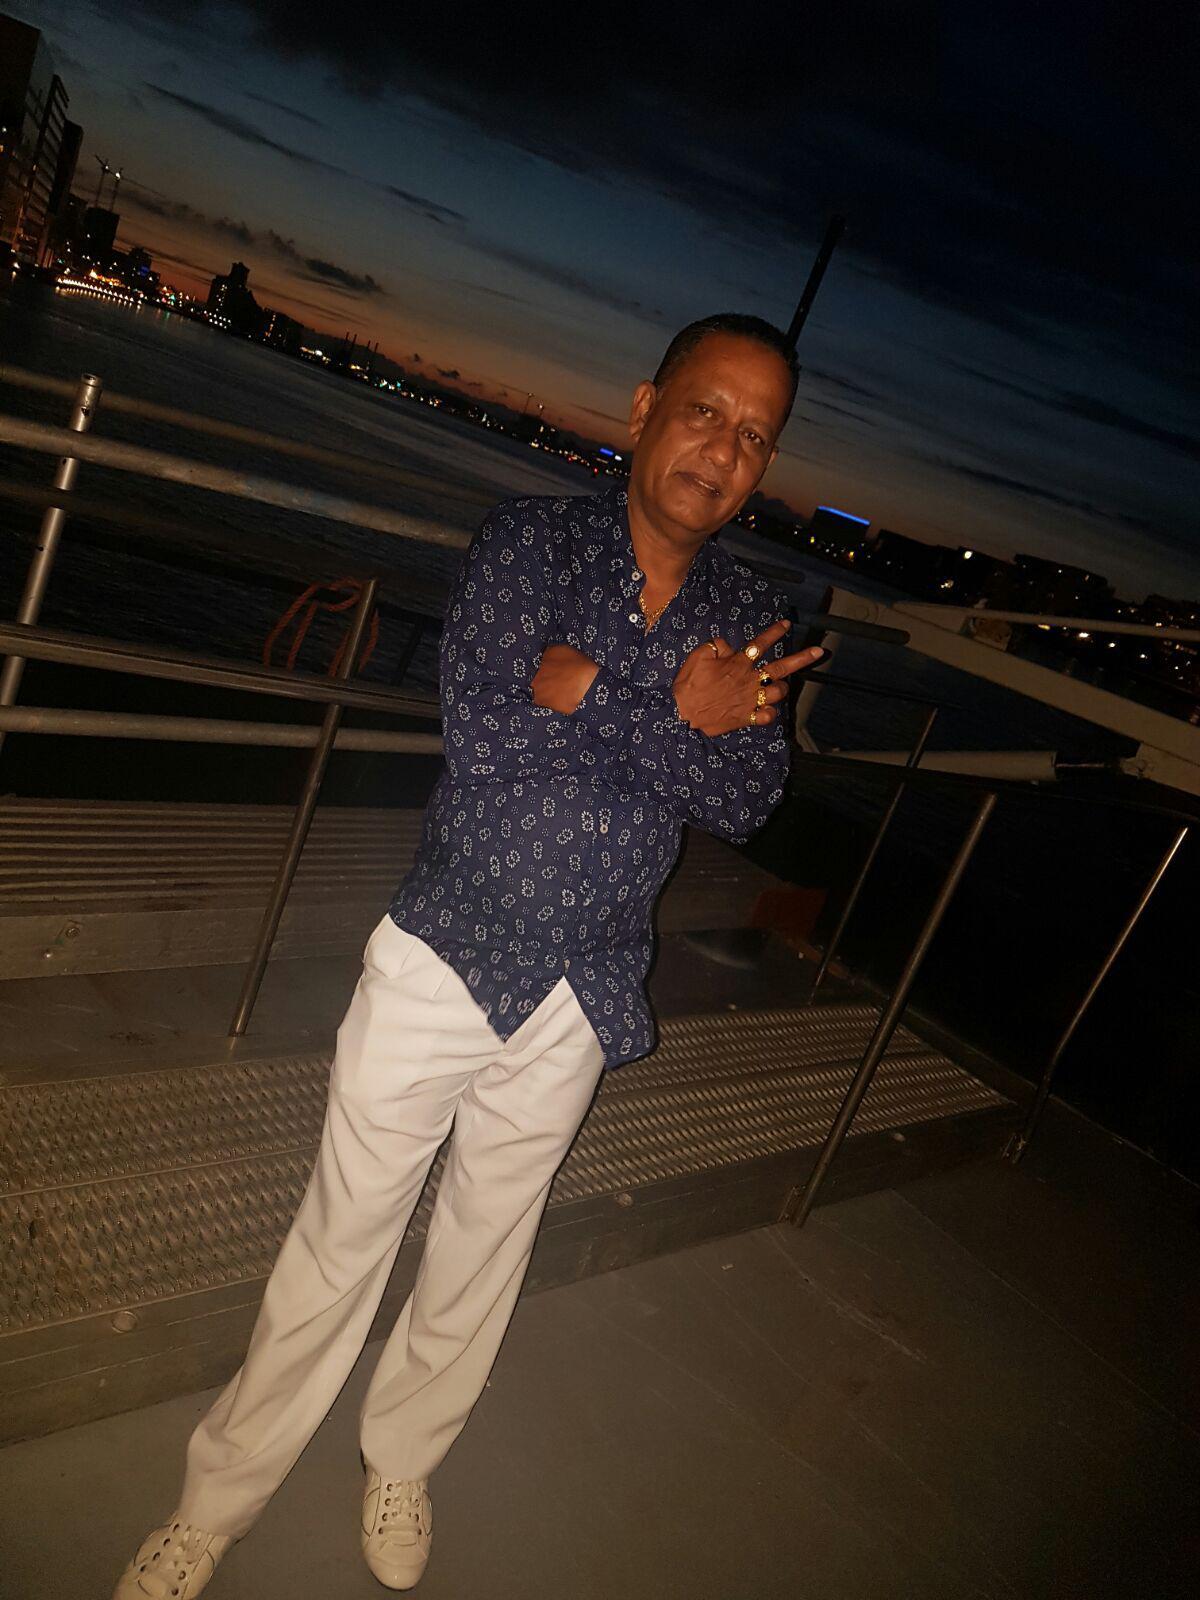 Ronald Mohamed Mustapha  Abdoelrahman